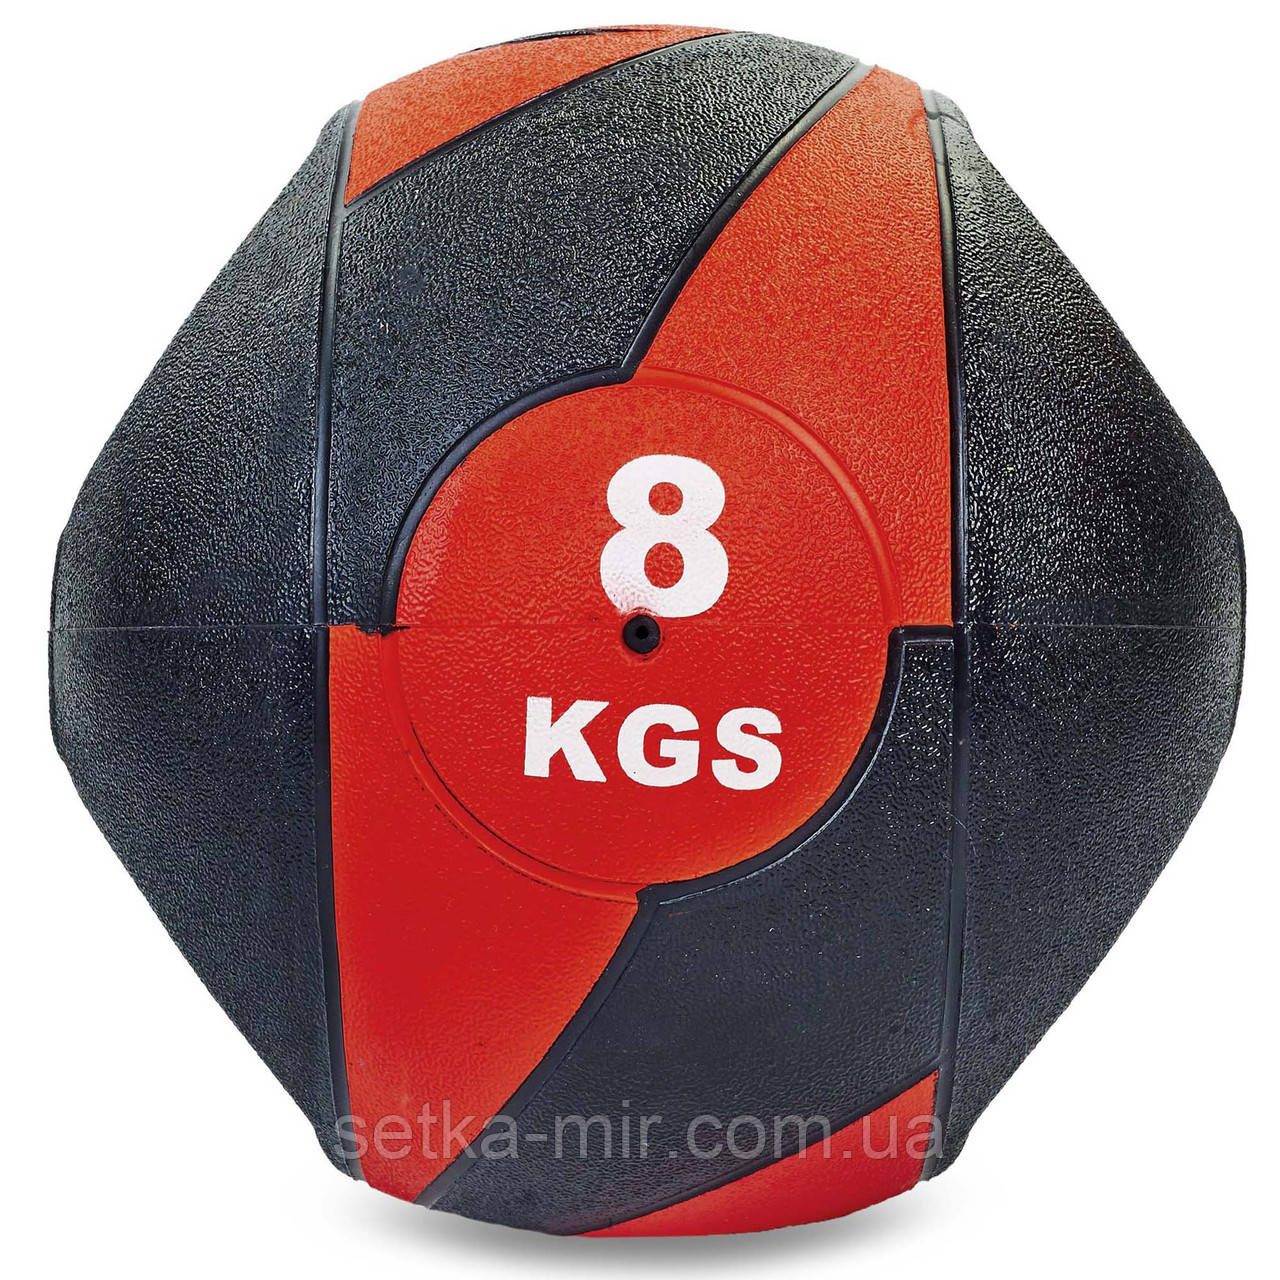 Мяч медицинский медбол с двумя рукоятками Record Medicine Ball FI-5111-8 8кг